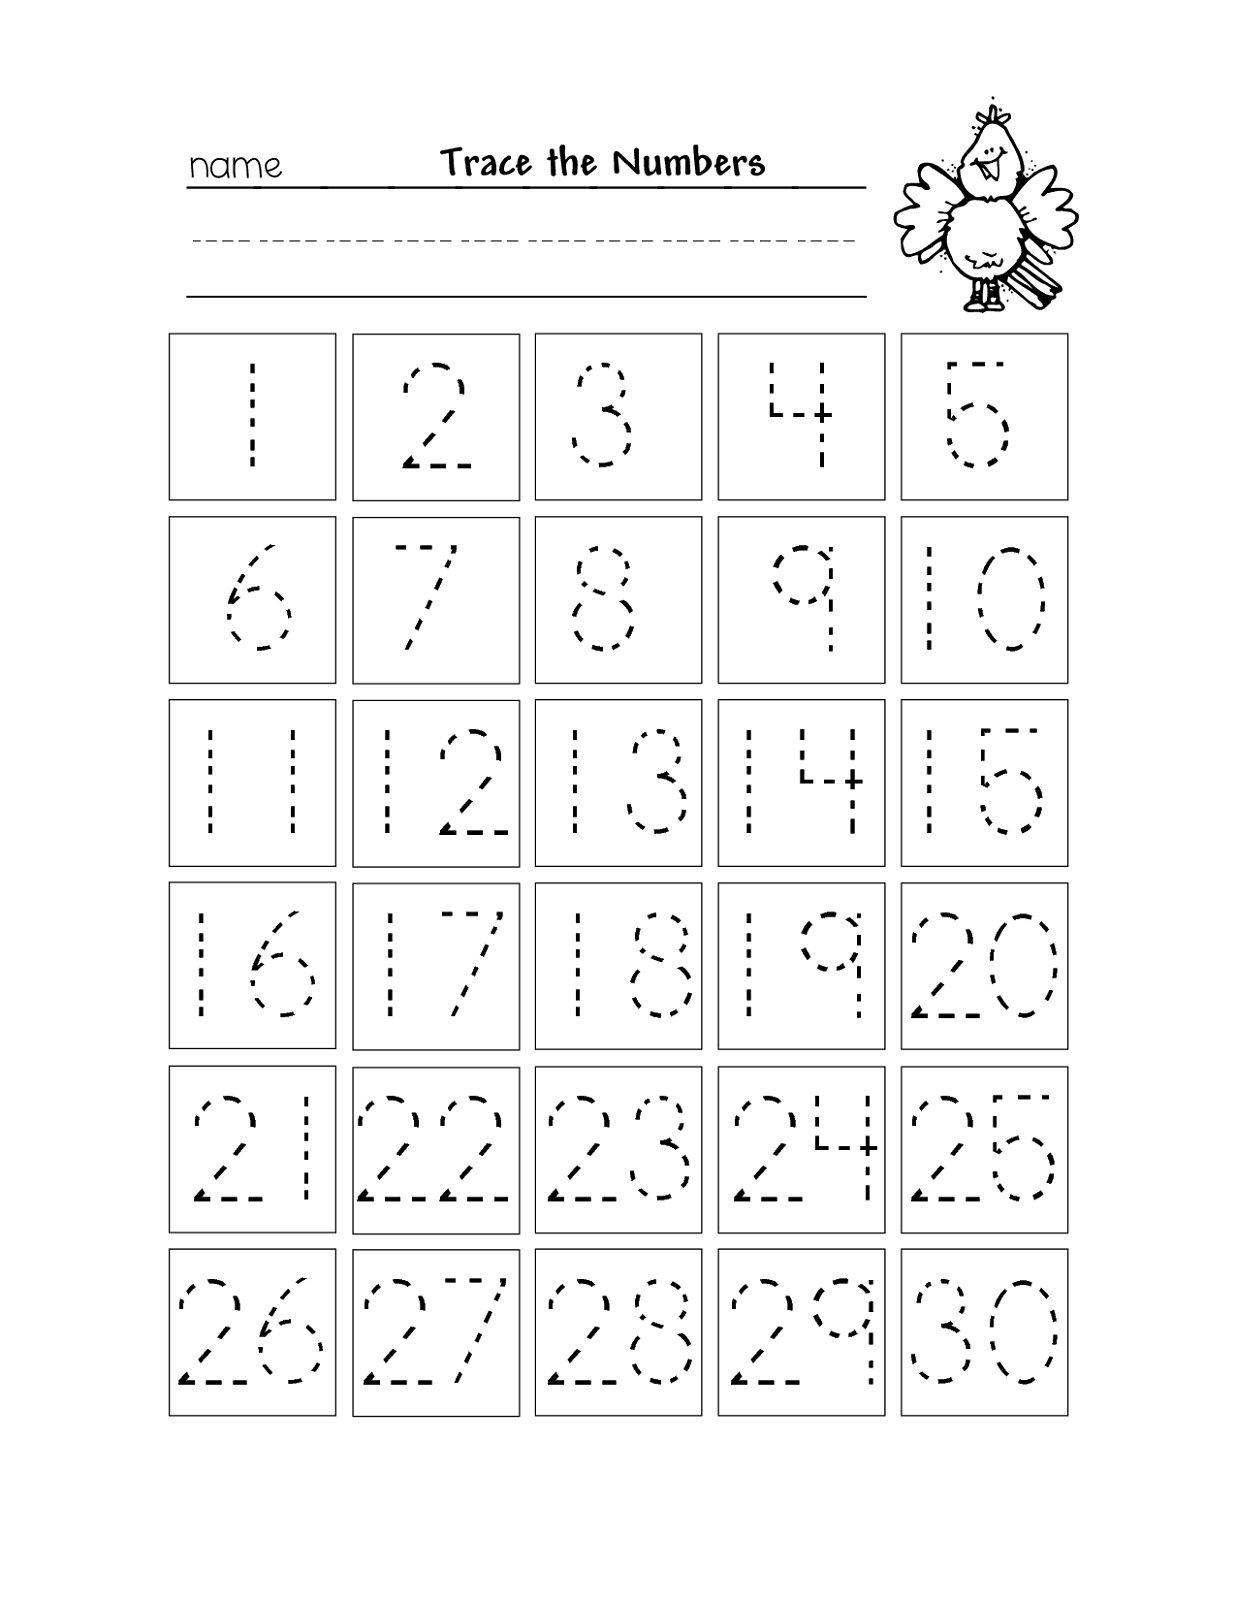 Free Preschool Kindergarten Worksheets Counting Number